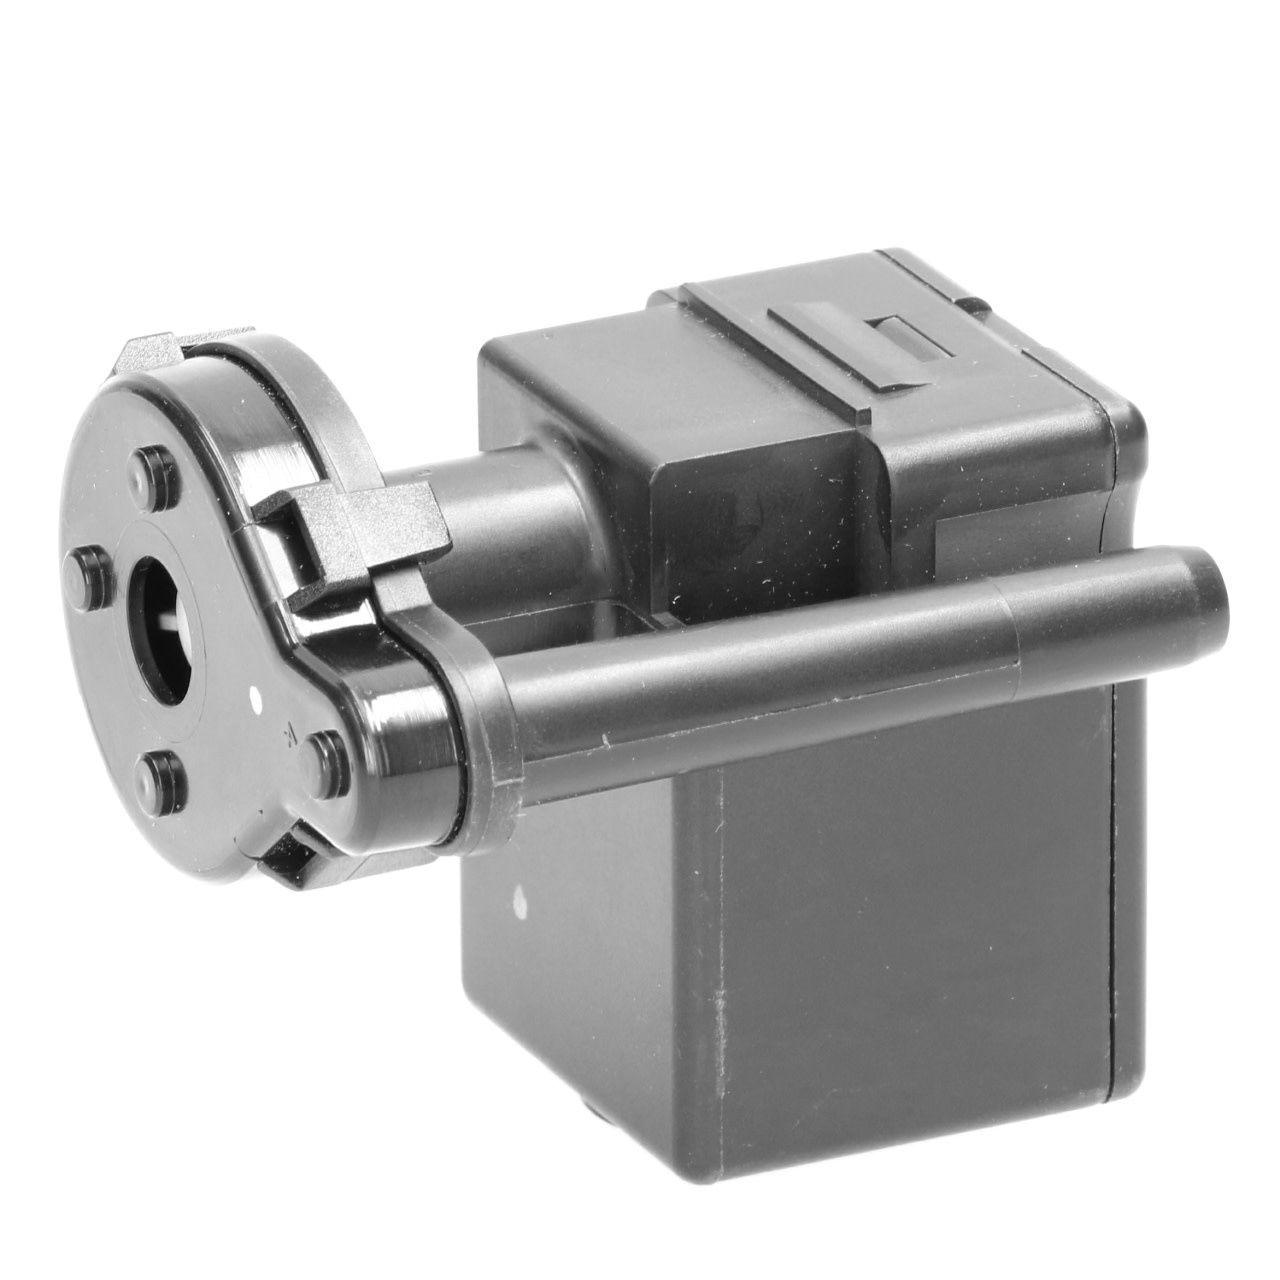 Drain Pump for Beko Tumble Dryers Beko / Blomberg